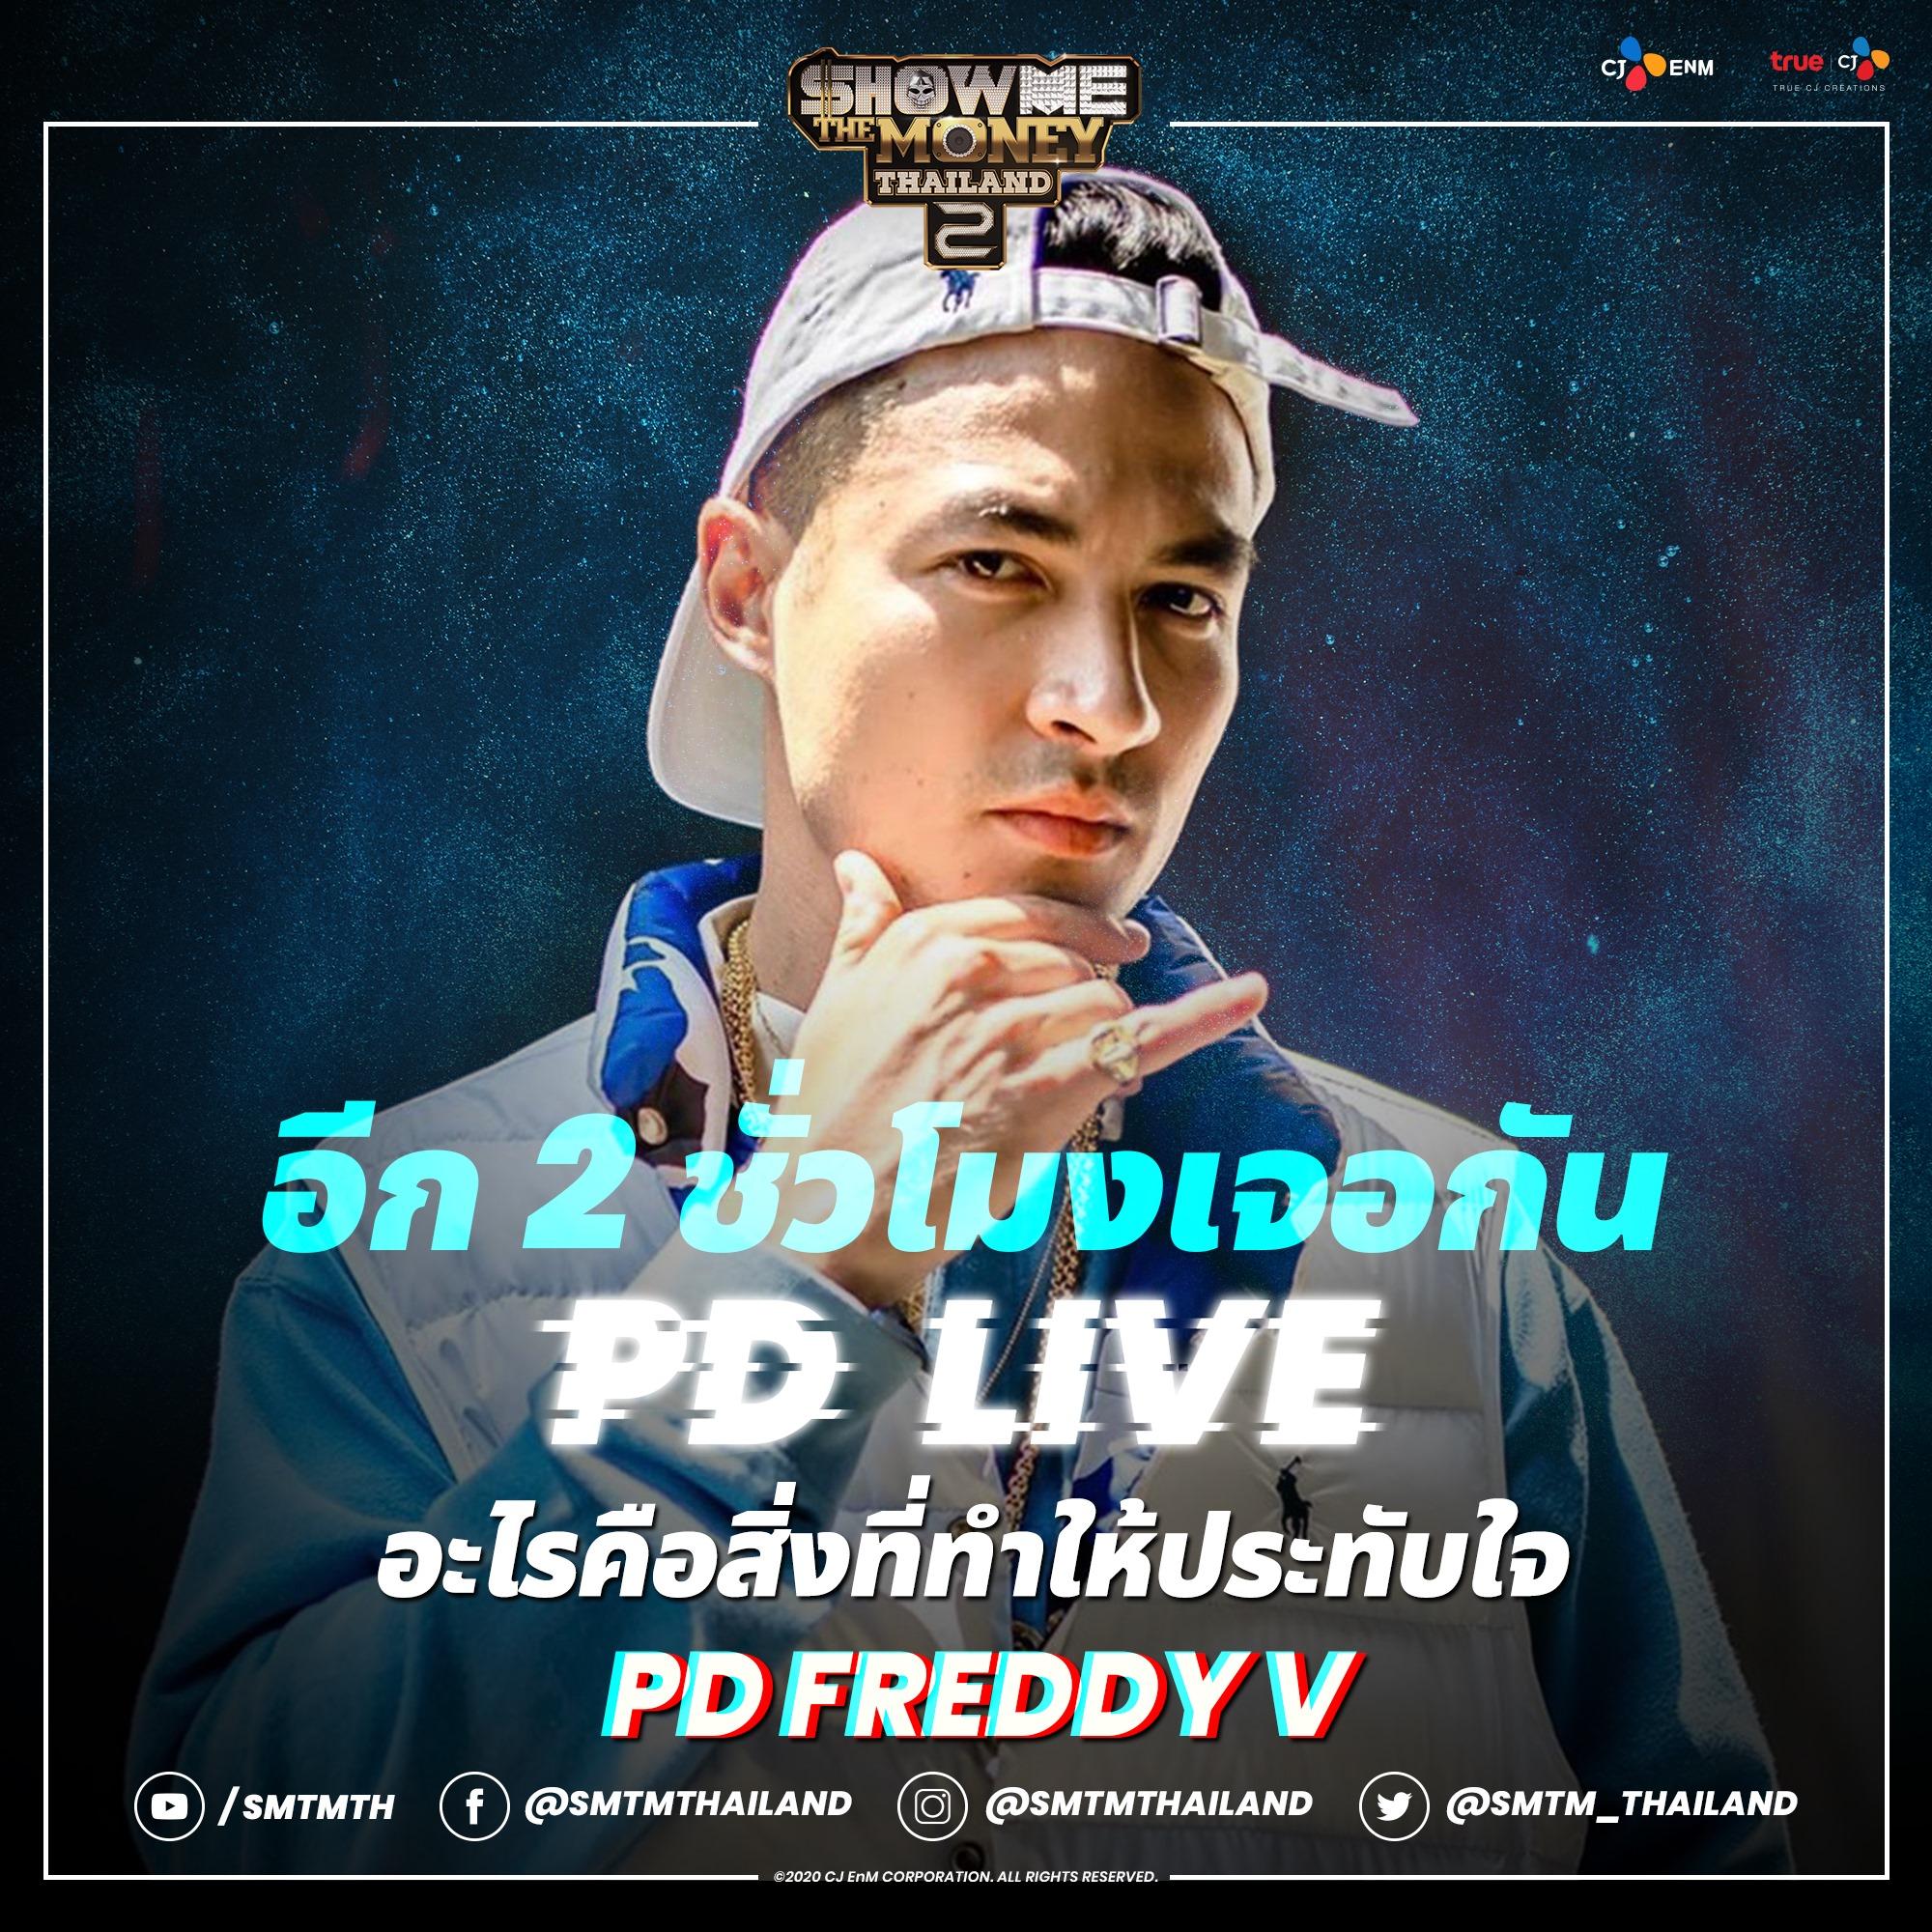 PD LIVE FREDDY V